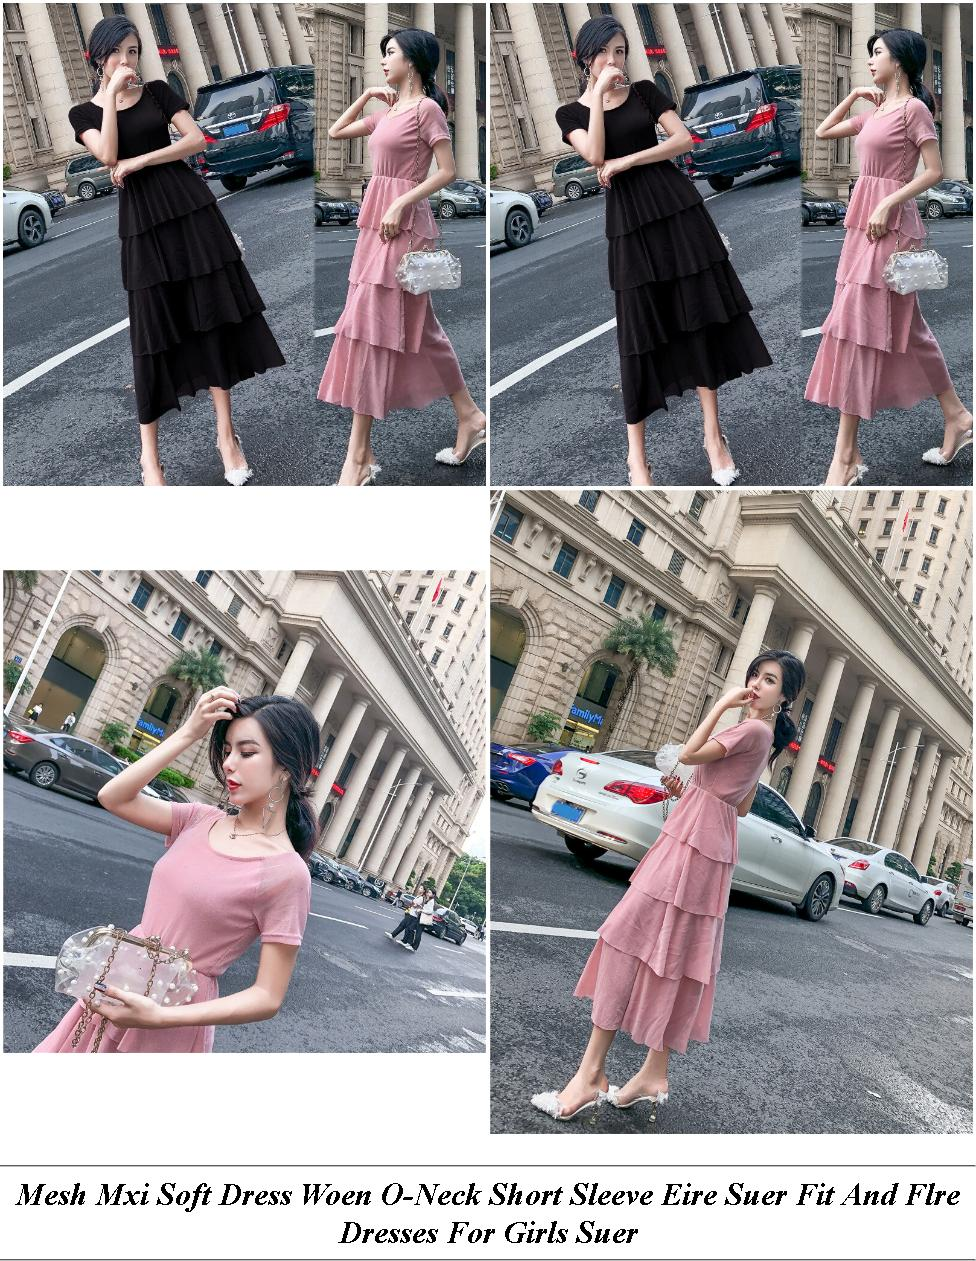 Plus Size Formal Dresses Online - Shopping For Sale In Radford Va - Striped Summer Dresses